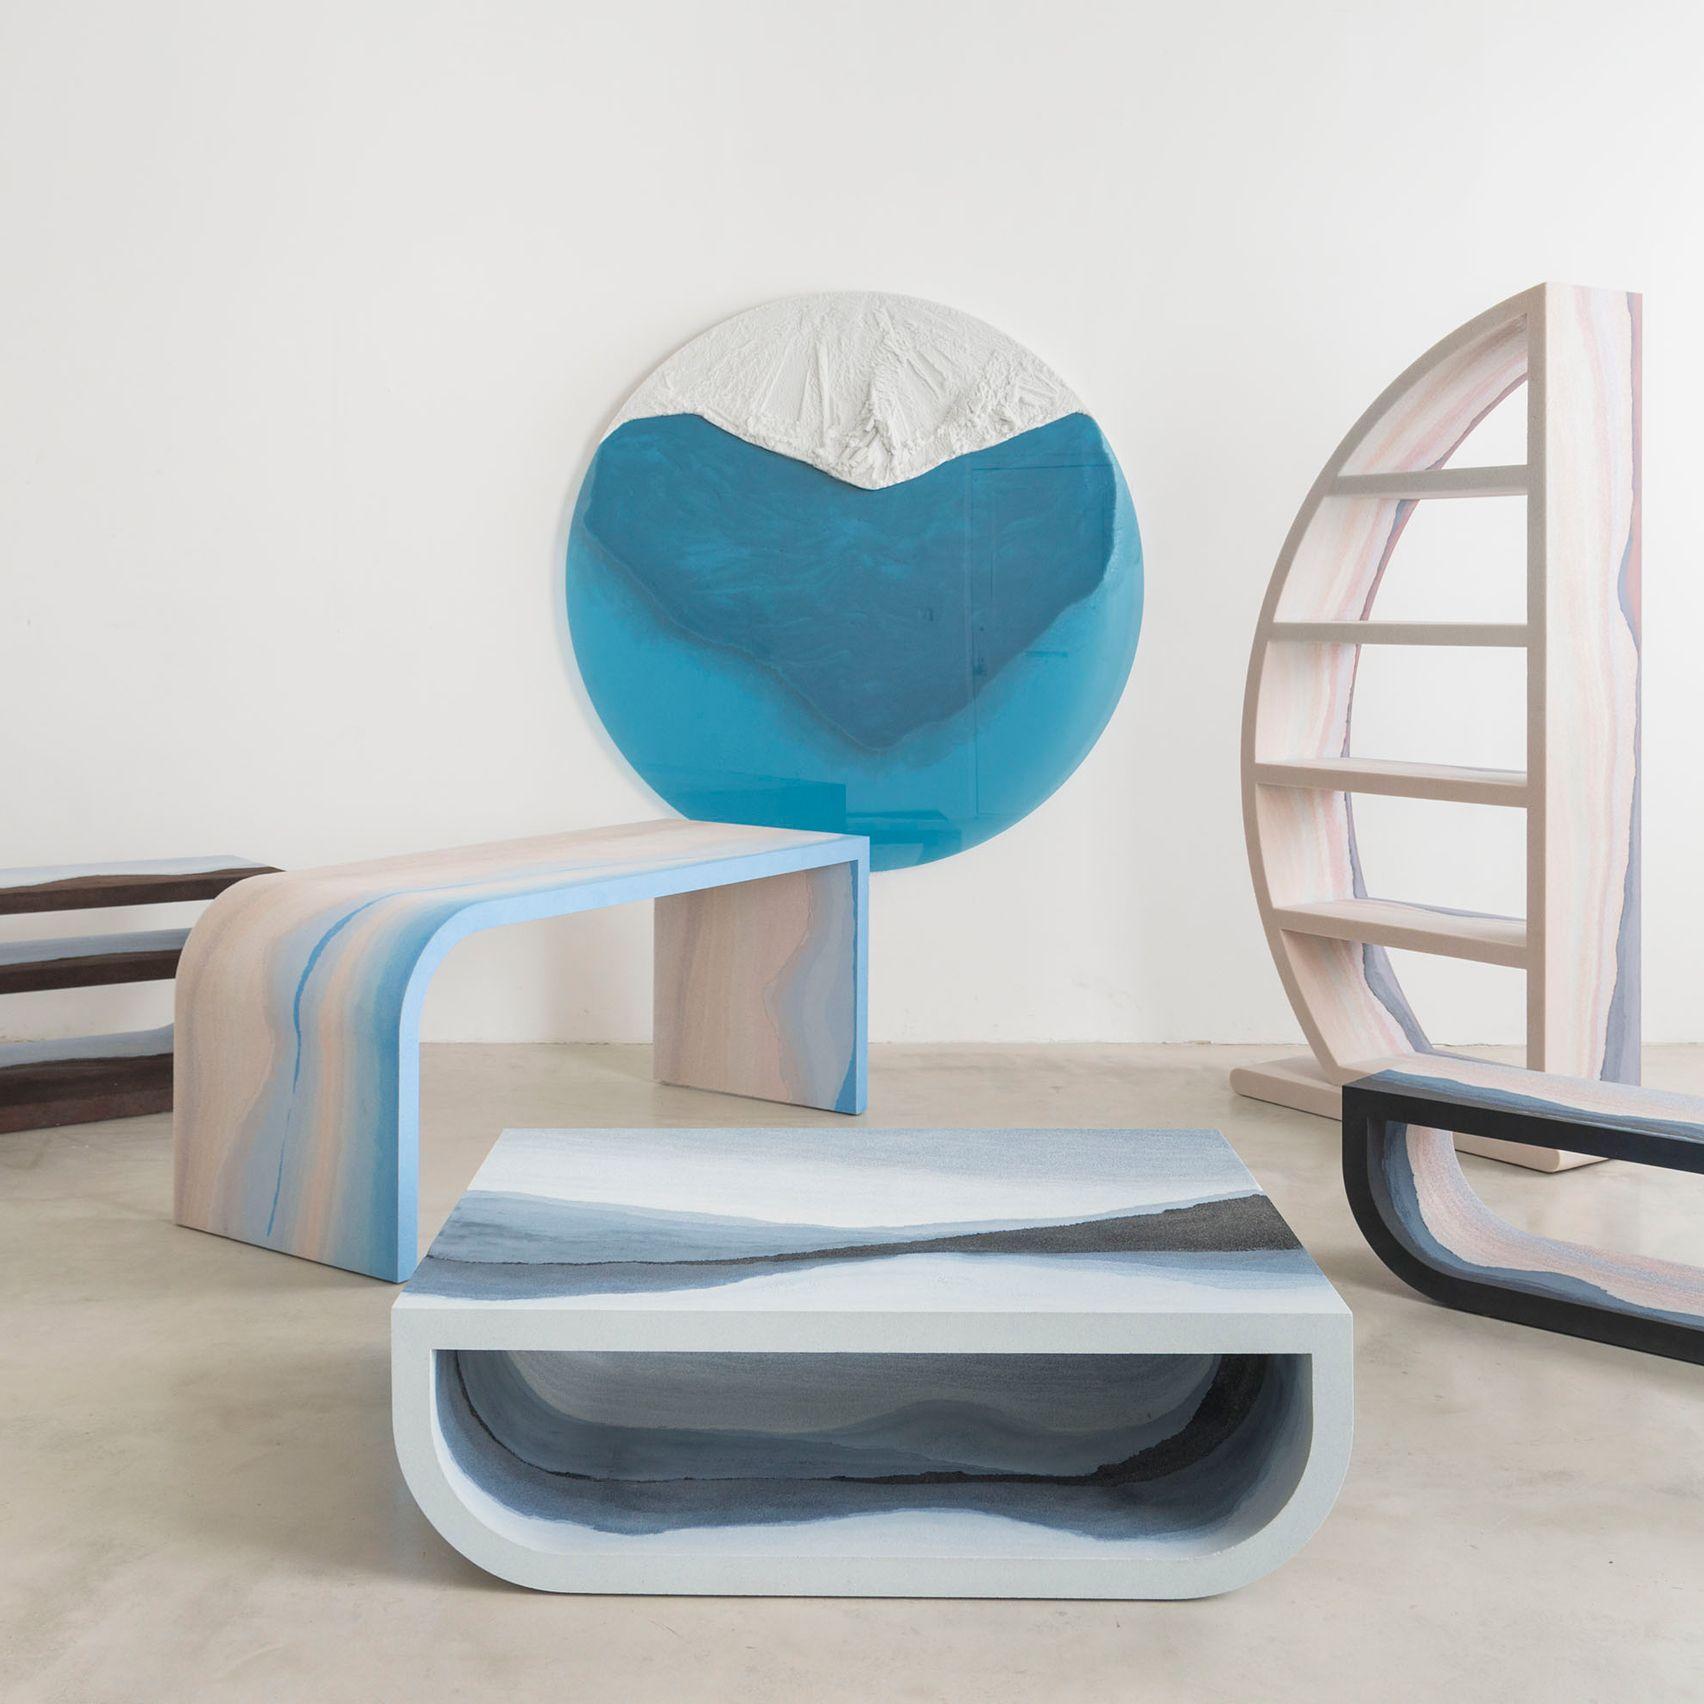 Fernando Mastrangelo s Escape furniture evokes landscapes through